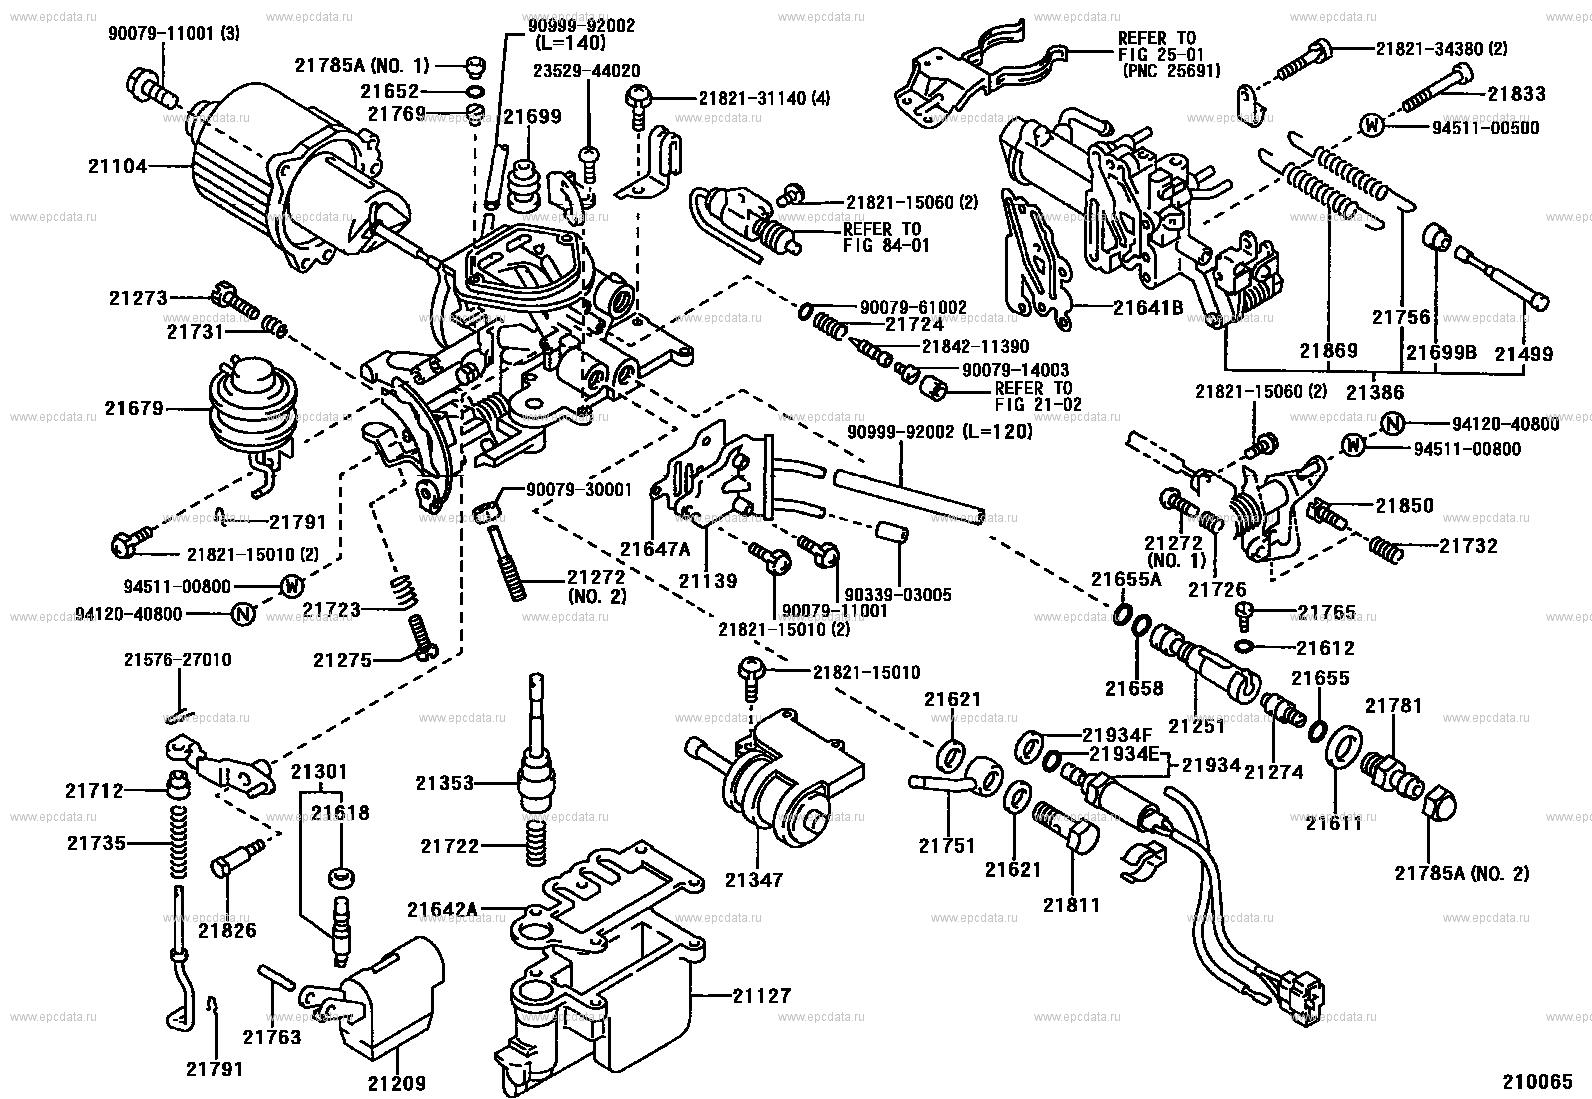 Carburetor For Toyota Corolla Ee90 Genuine Parts